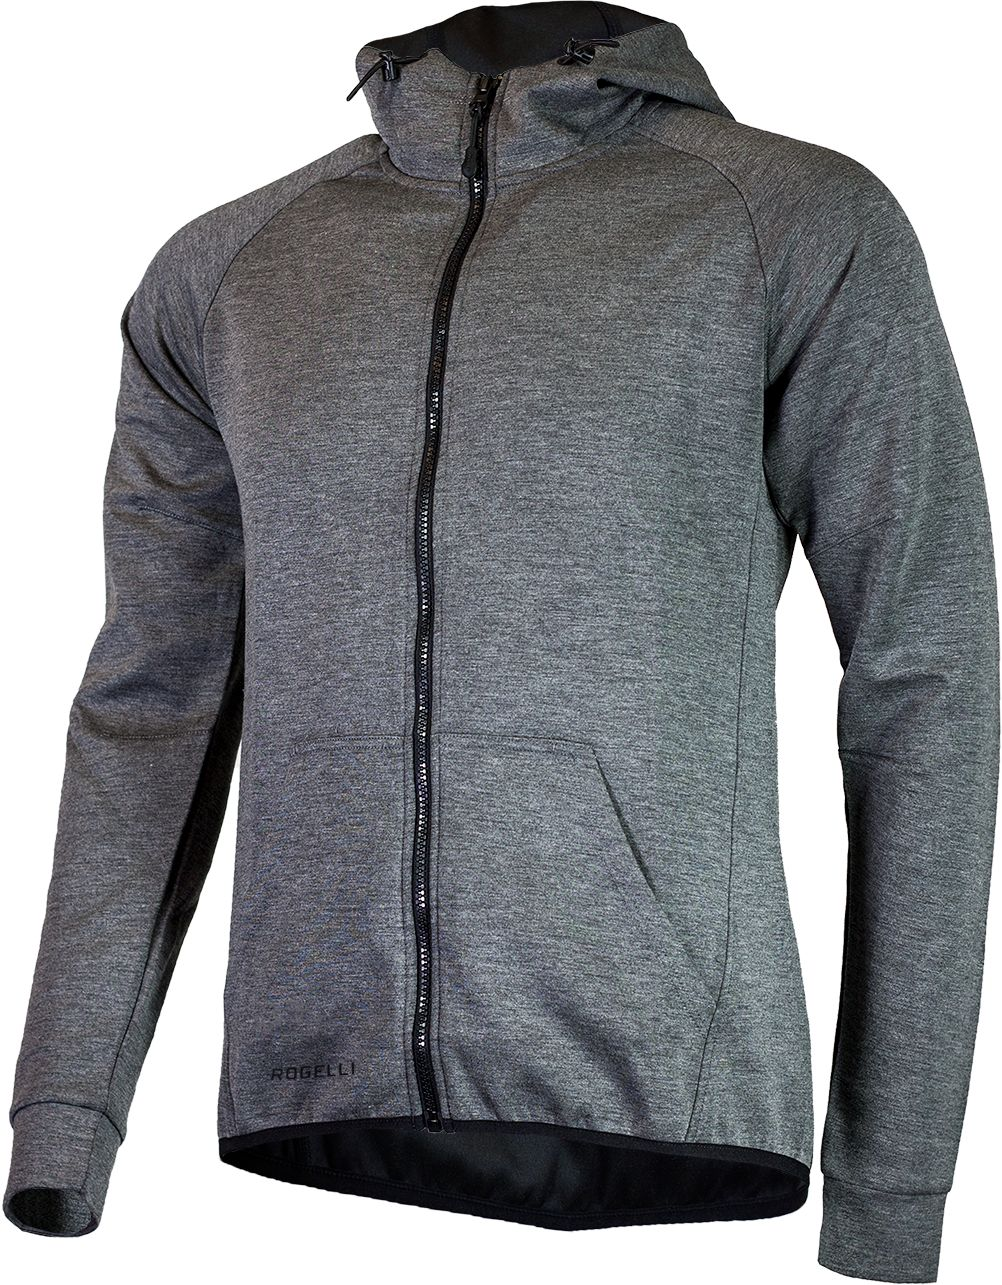 ROGELLI bluza męska z kapturem TRENING grey Rozmiar: L,050.600.XL